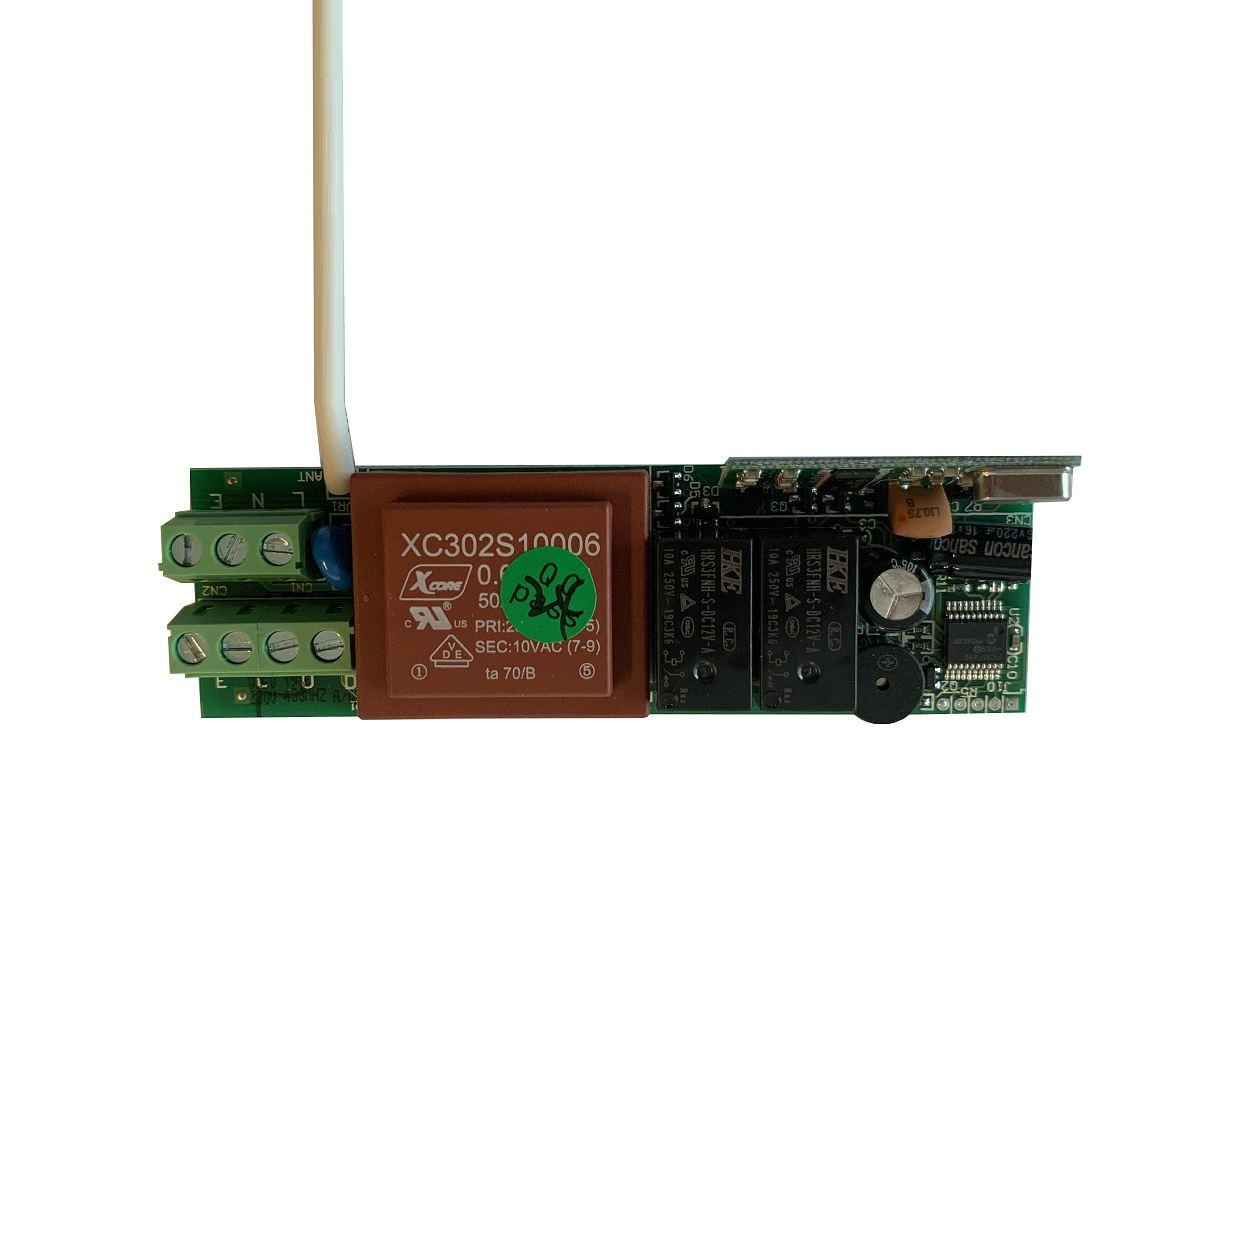 Brel DC50 draadloze mini ontvanger